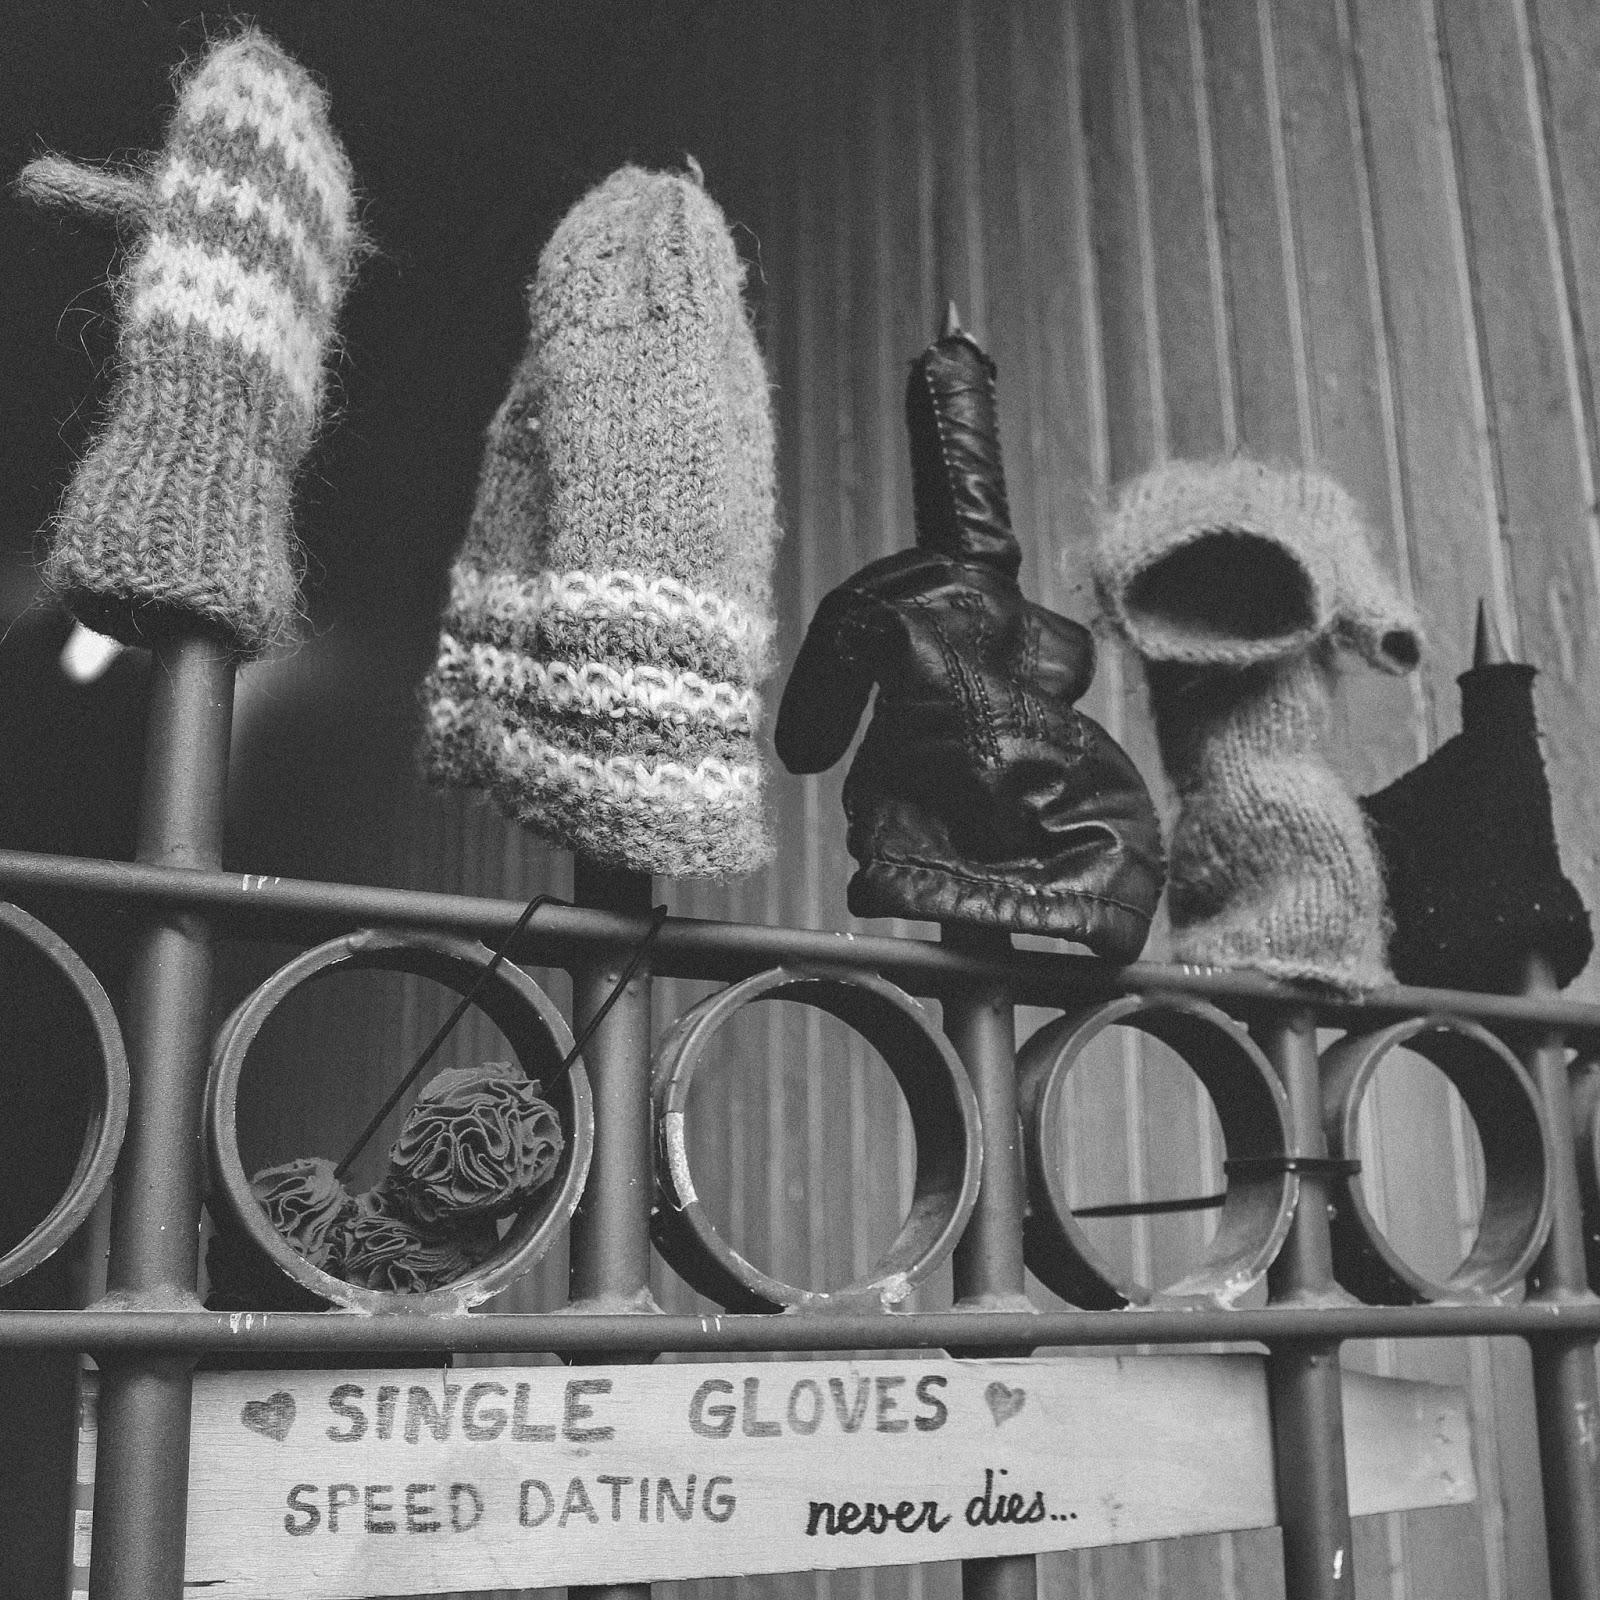 Single gloves speed dating reykjavik weather